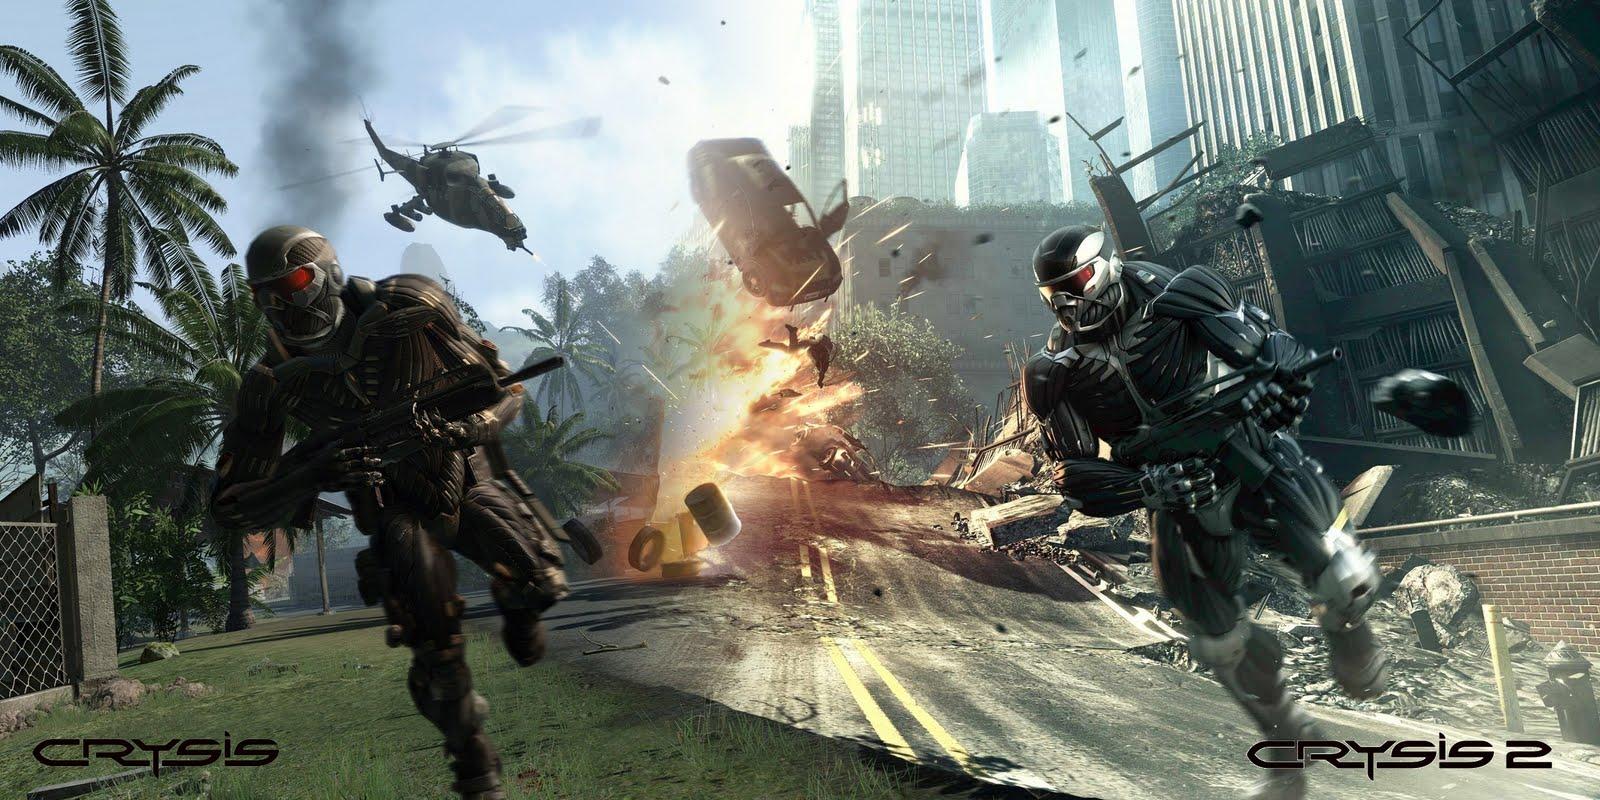 Фото: Crysis 2 коды активации.